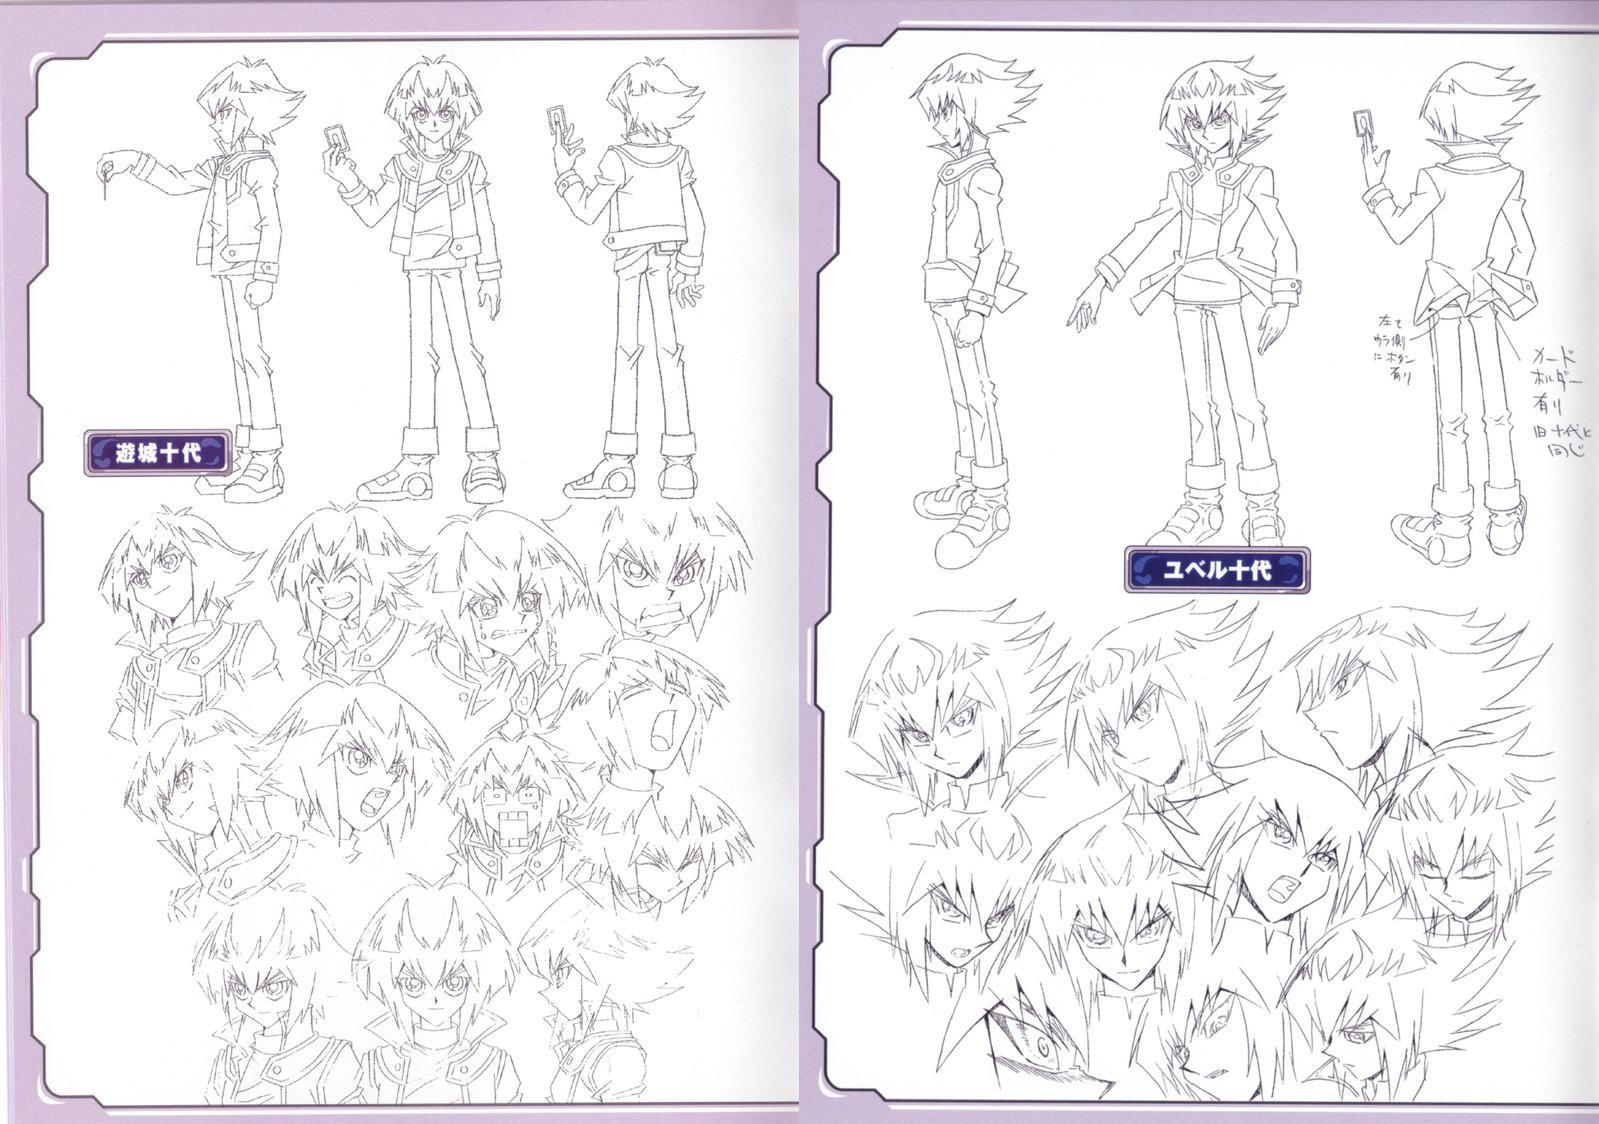 Yugioh Character Design : Category yu gi oh gx characters fandom